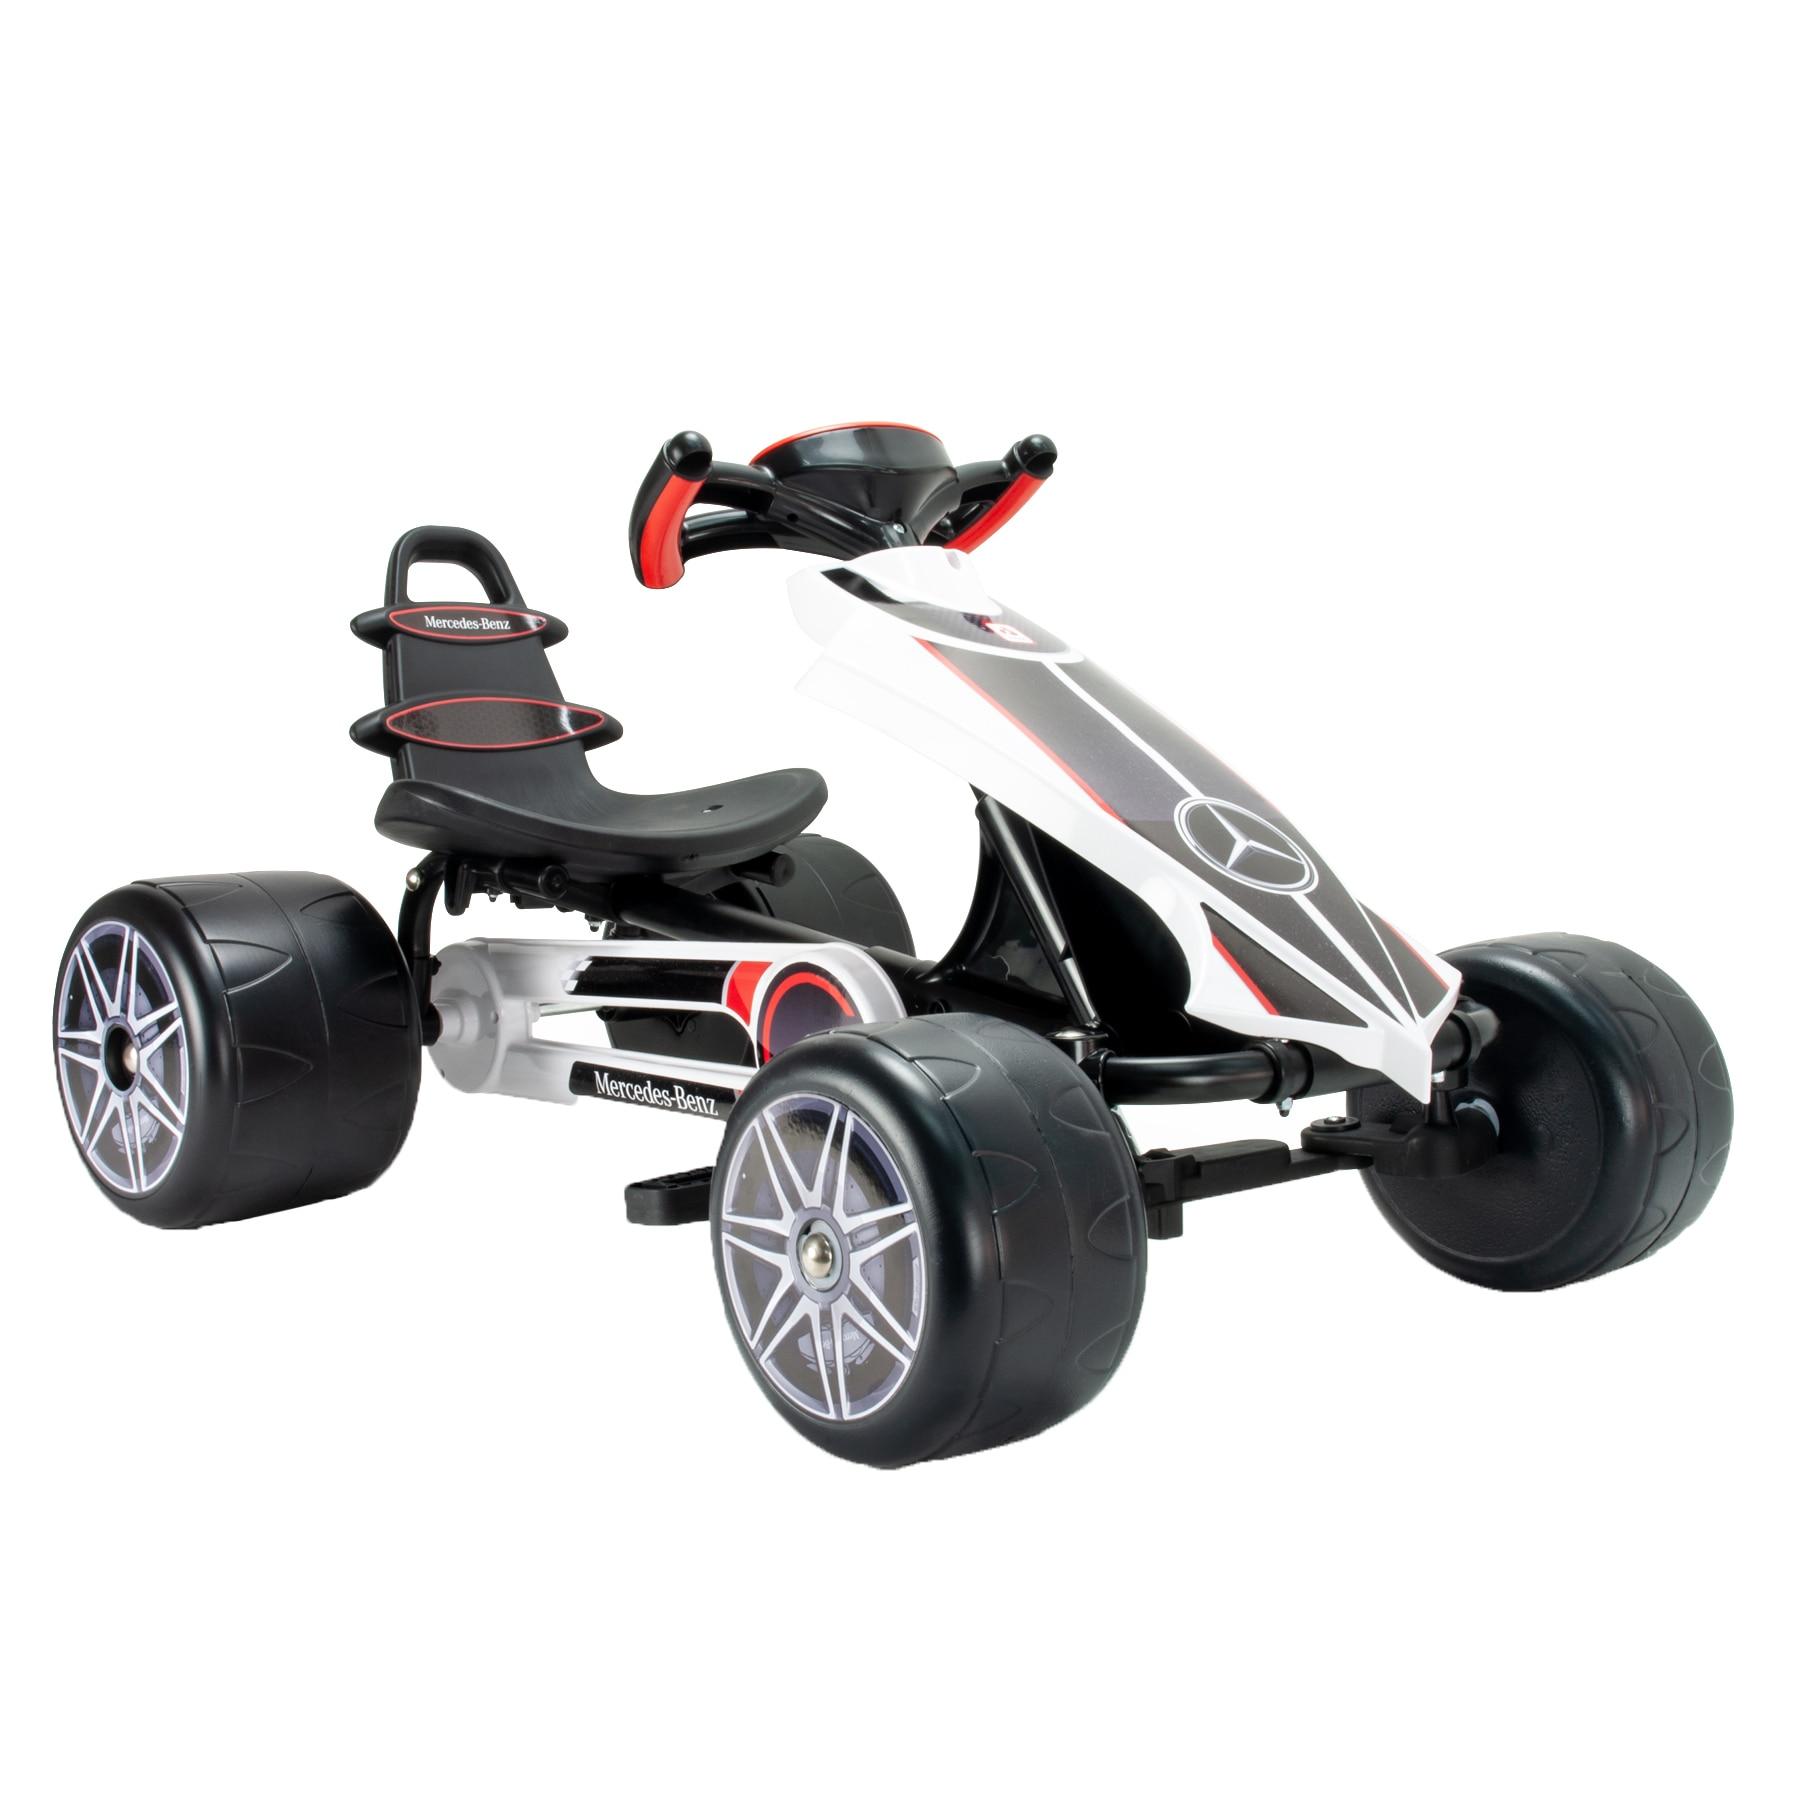 Fotografie Cart cu pedate pentru copii Injusa - Mercedes, Go kart Flecha